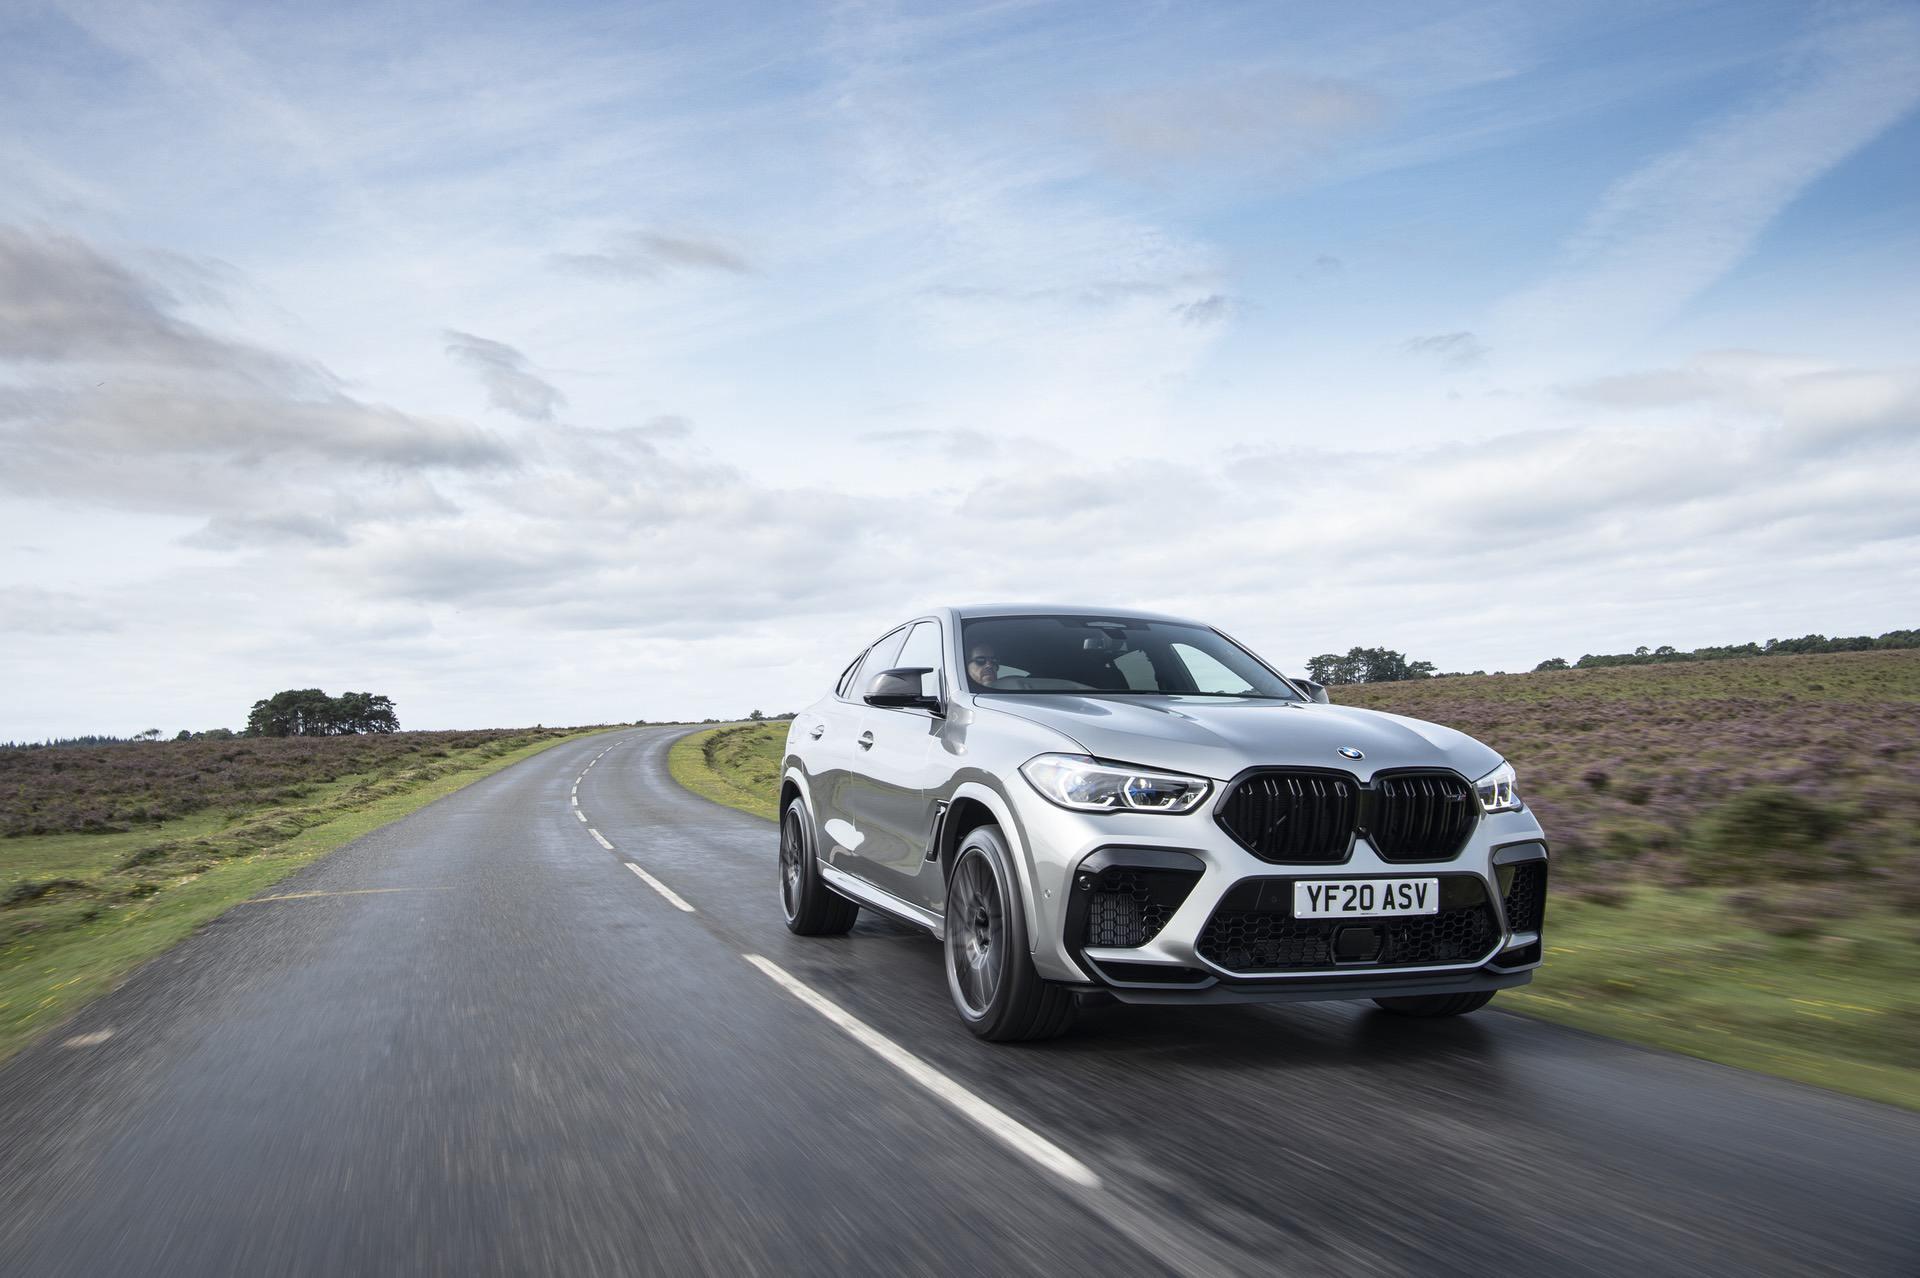 2021 bmw x6m Donington Grey metallic 06